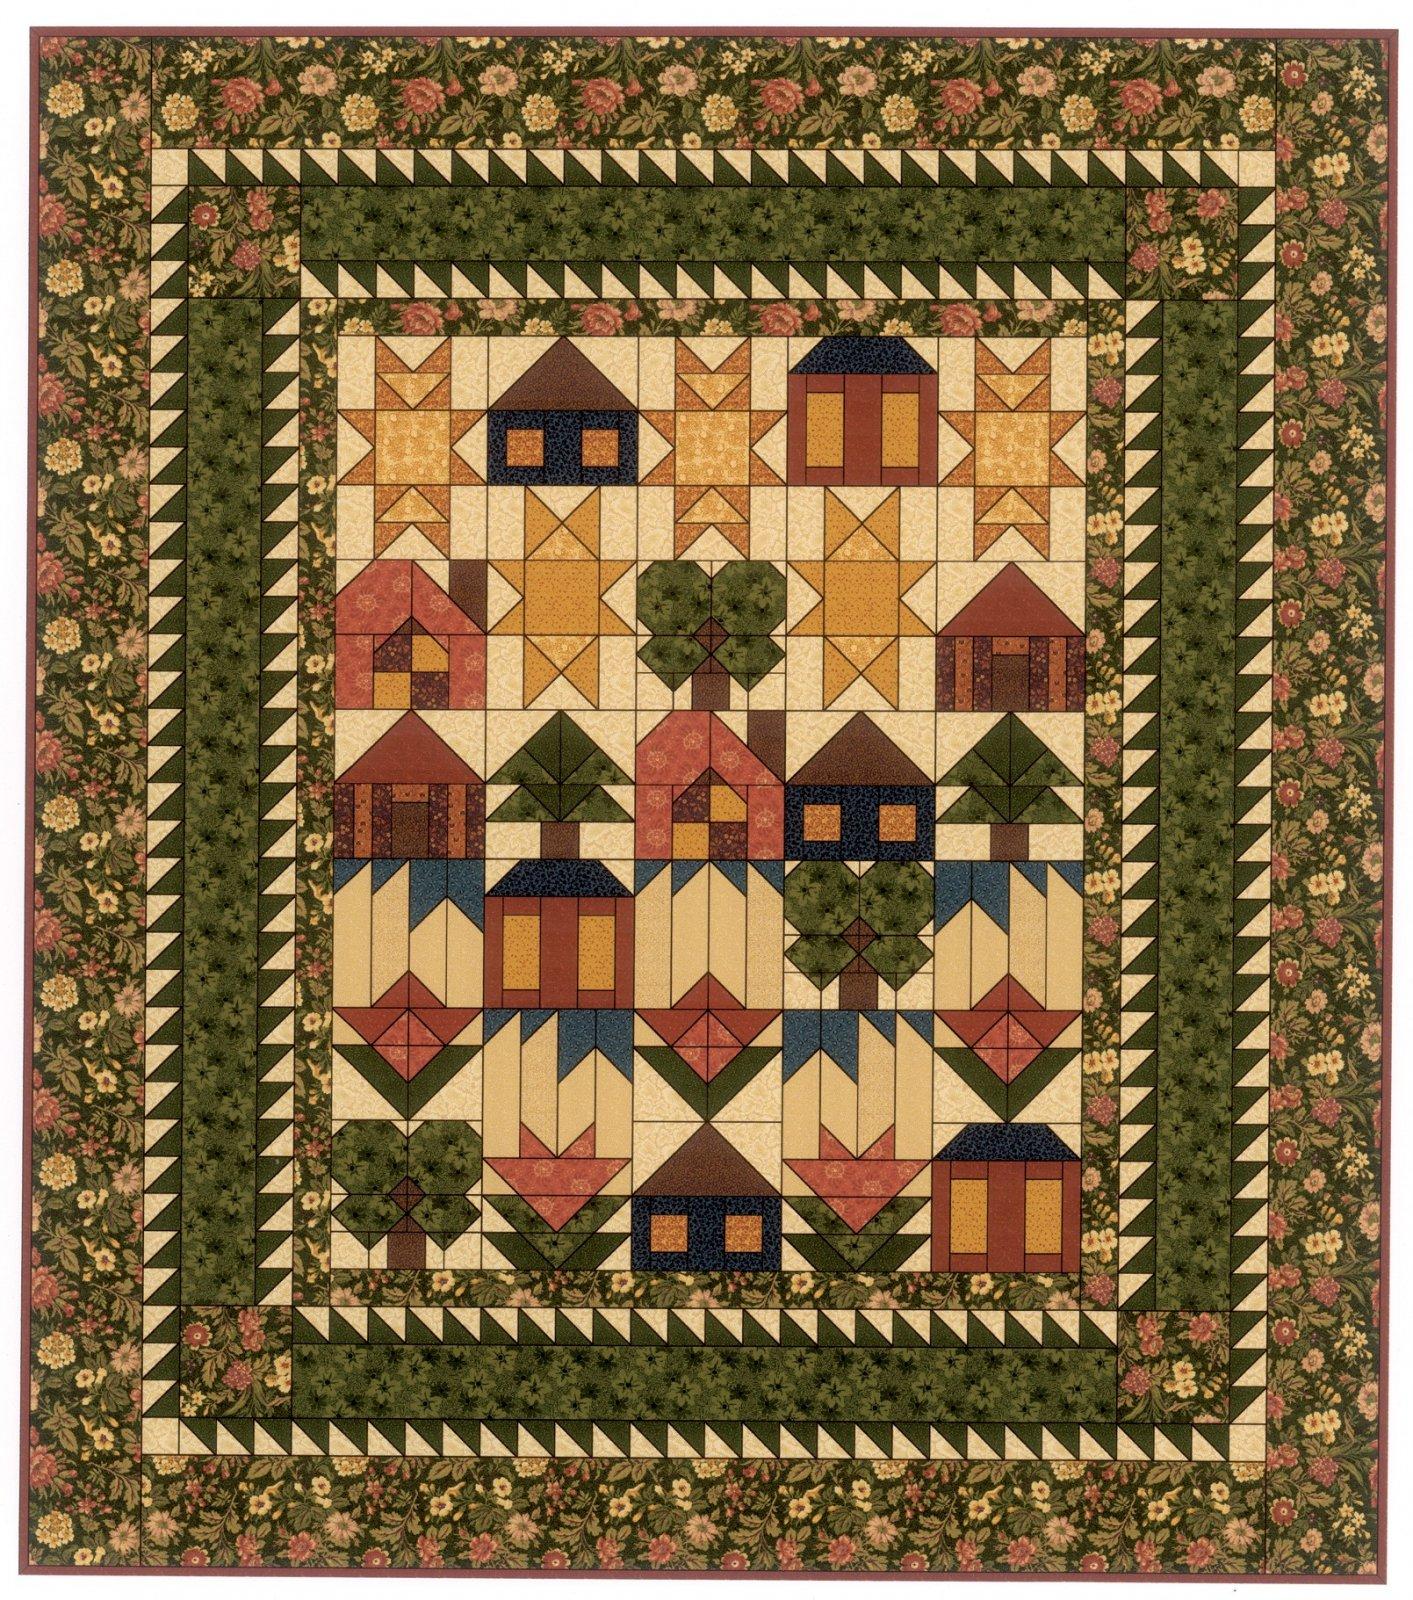 Thimbleberries Village Green Fabrics